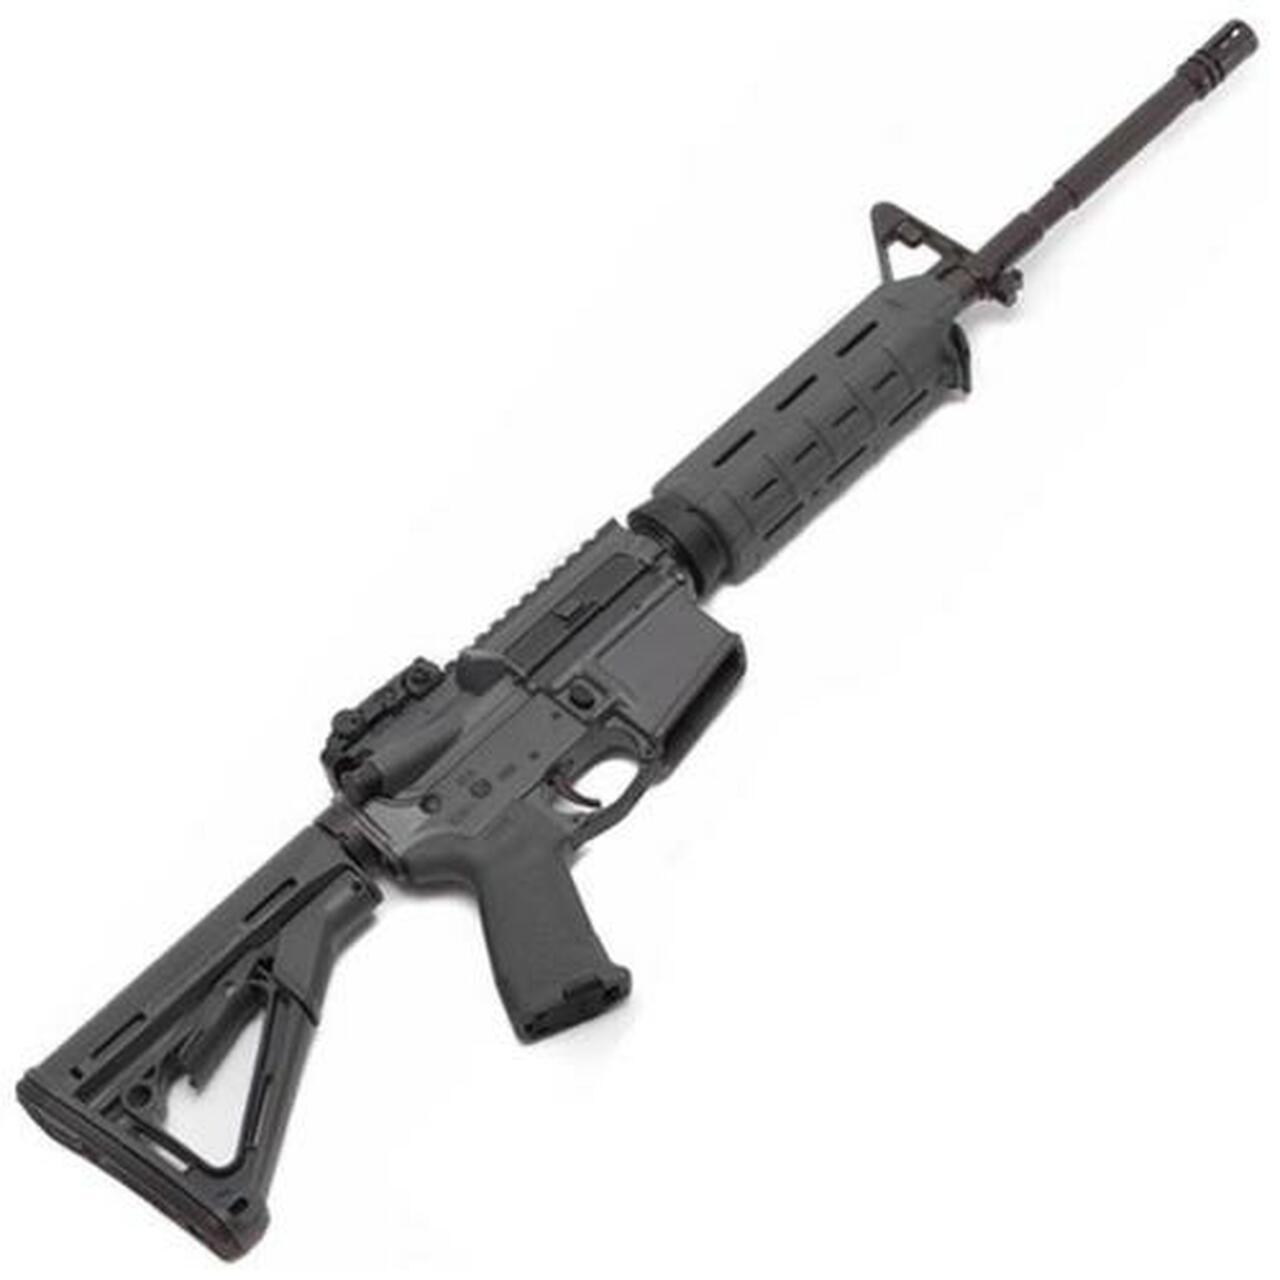 "Image of Spike's Tactical, M4LE 223/5.56 16"" Barrel, Grey, MOE Grip, Magpul CTR Stock & Backup Flip Sight No Magazine"